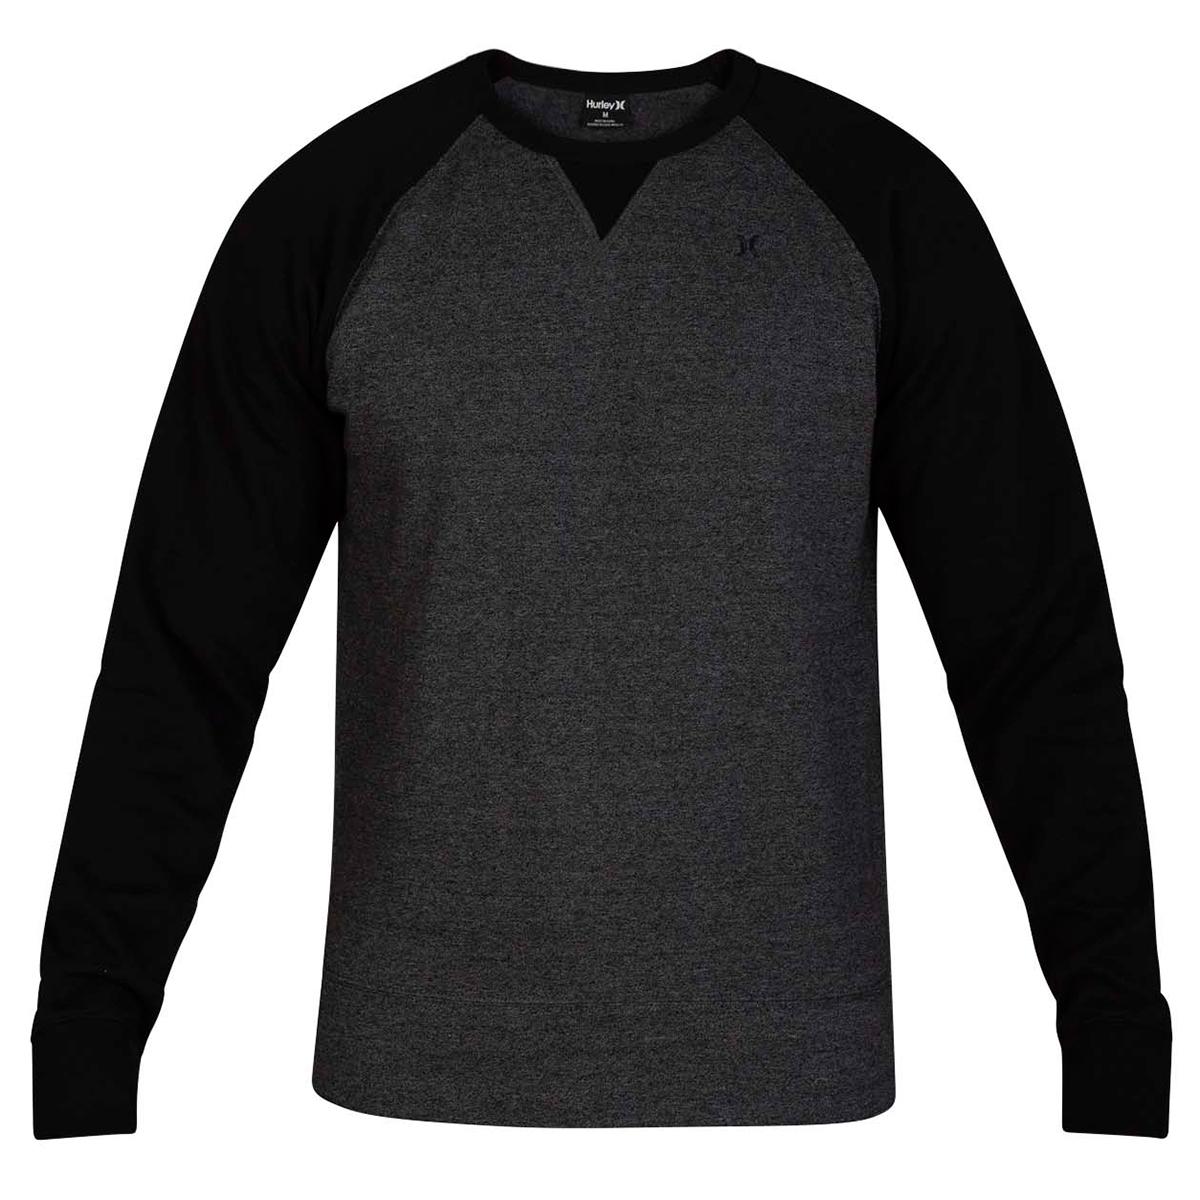 Hurley Men's Crone Long-Sleeve Crew - Black, XL